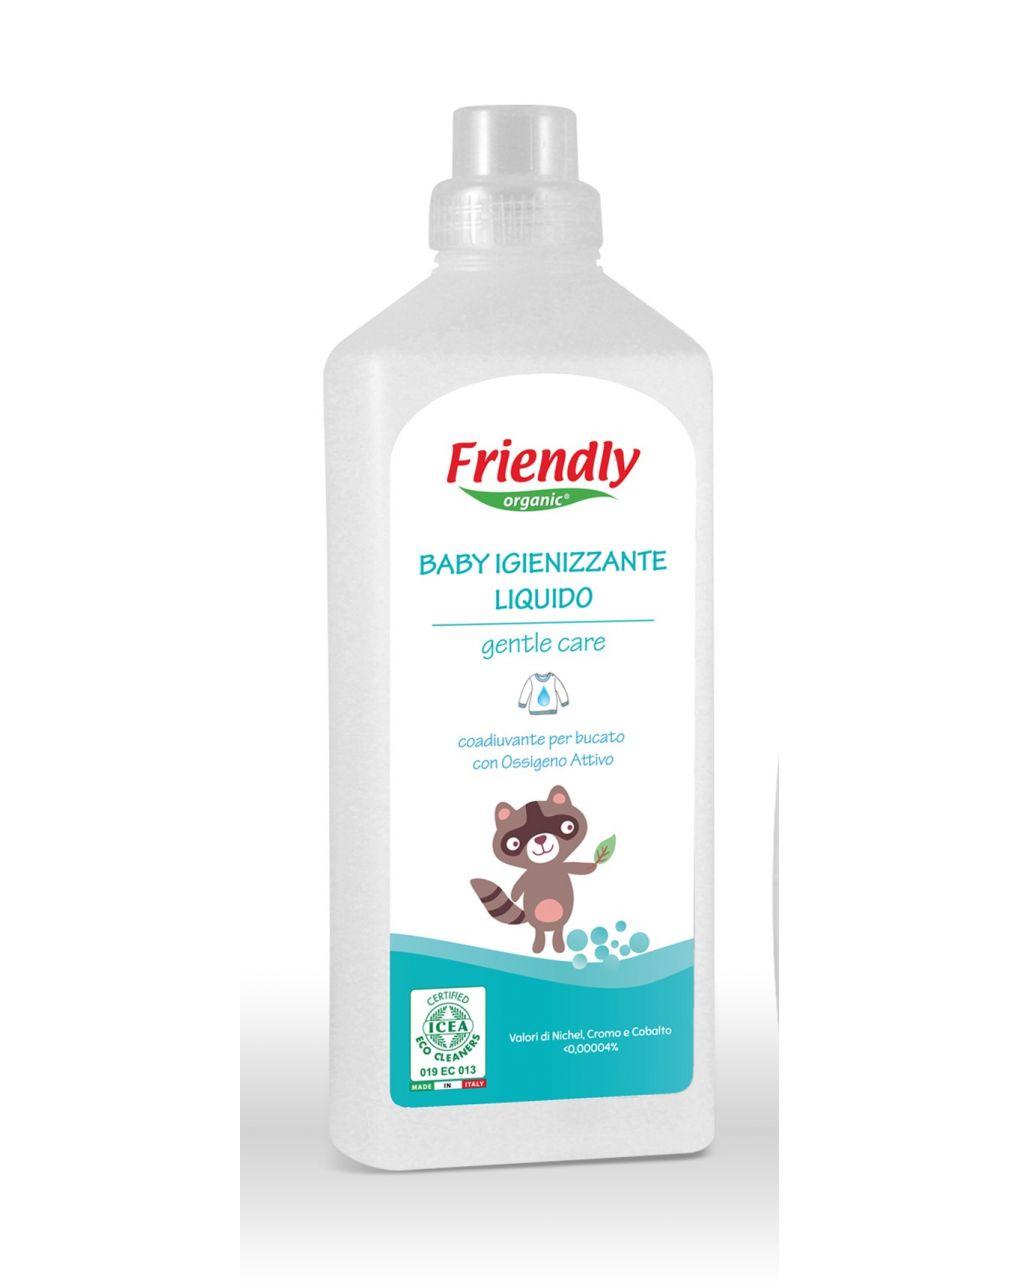 Baby igienizzante liquido 1 litro - Prénatal